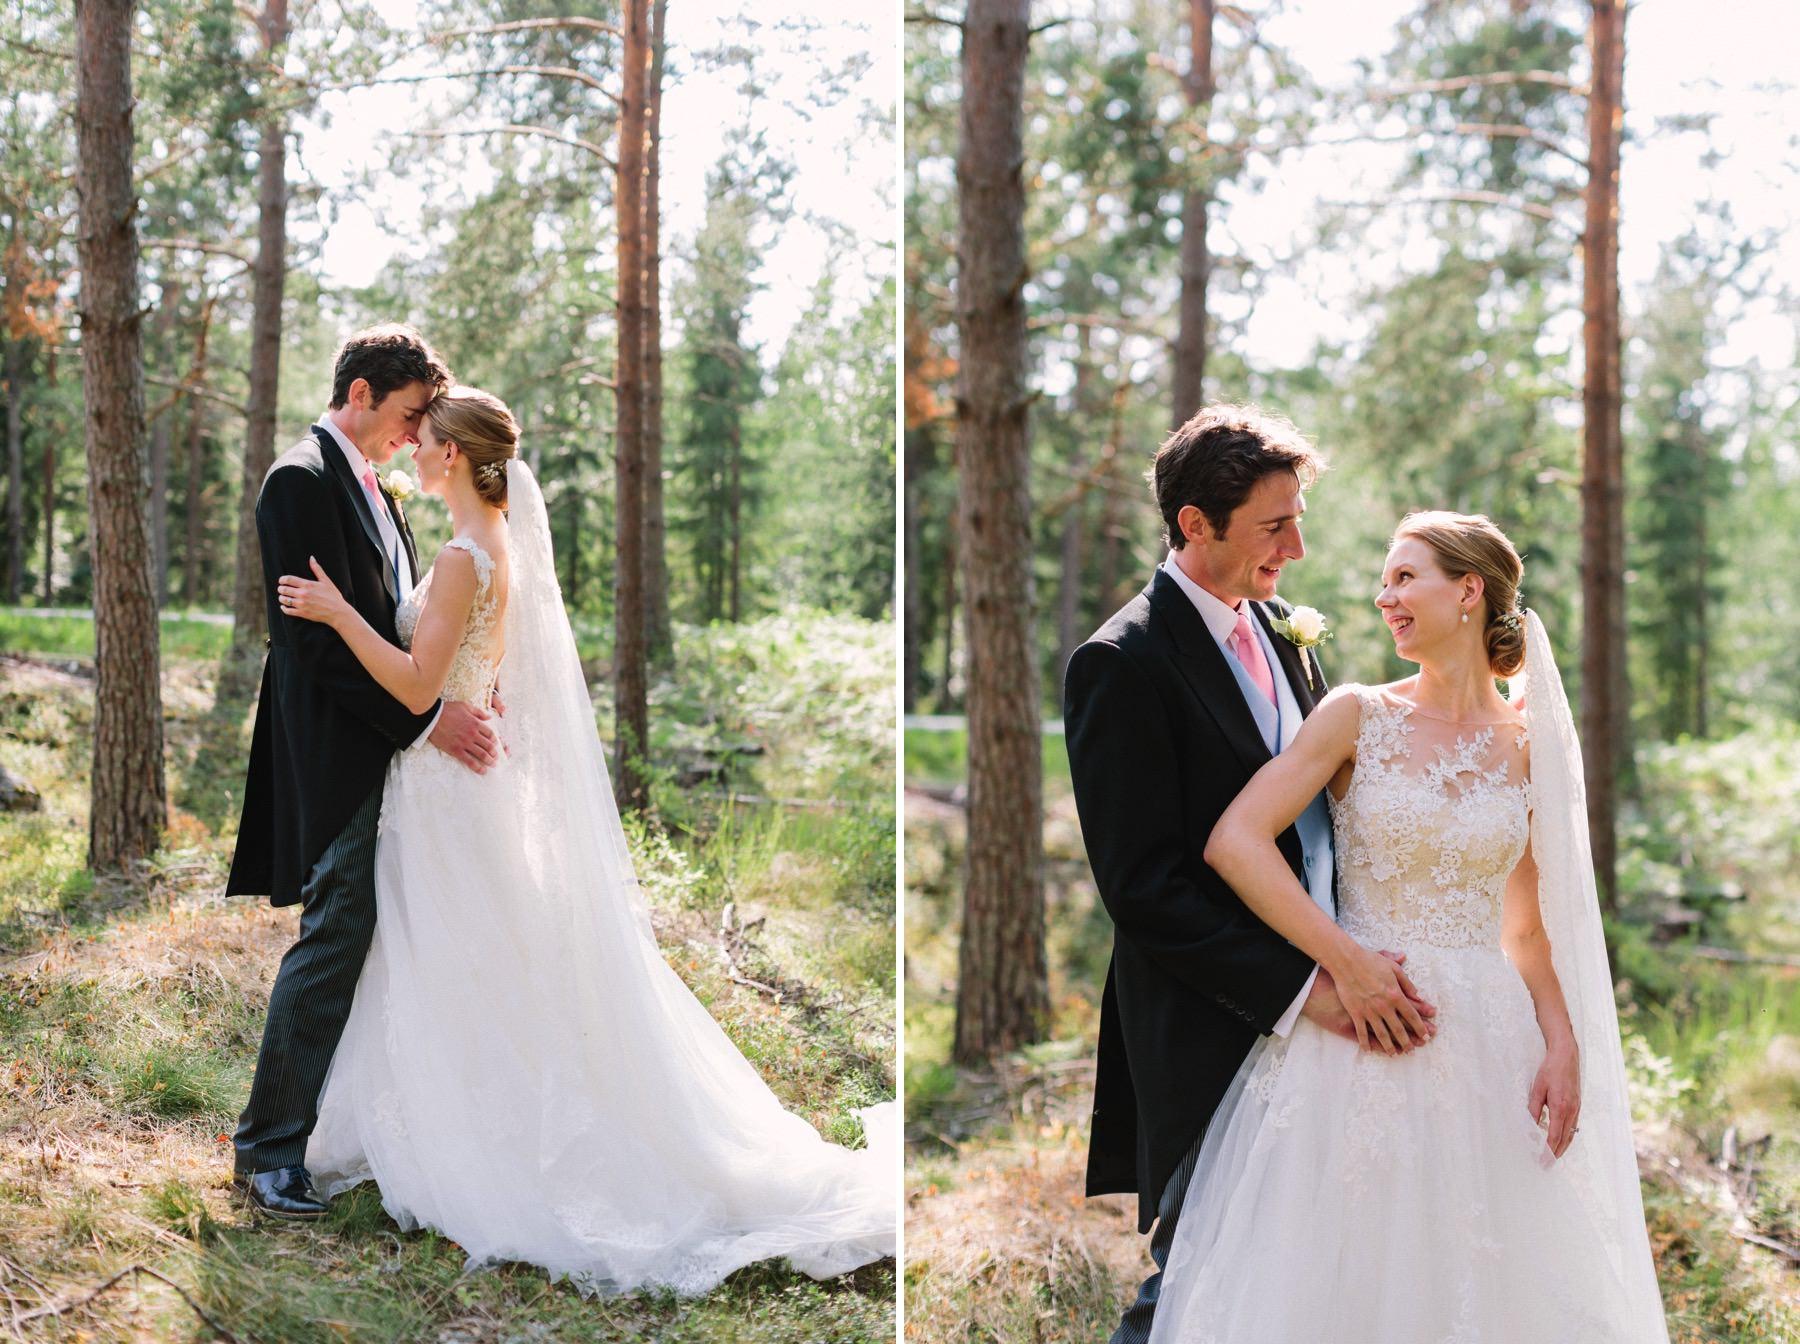 Snappertuna Calliola bröllop